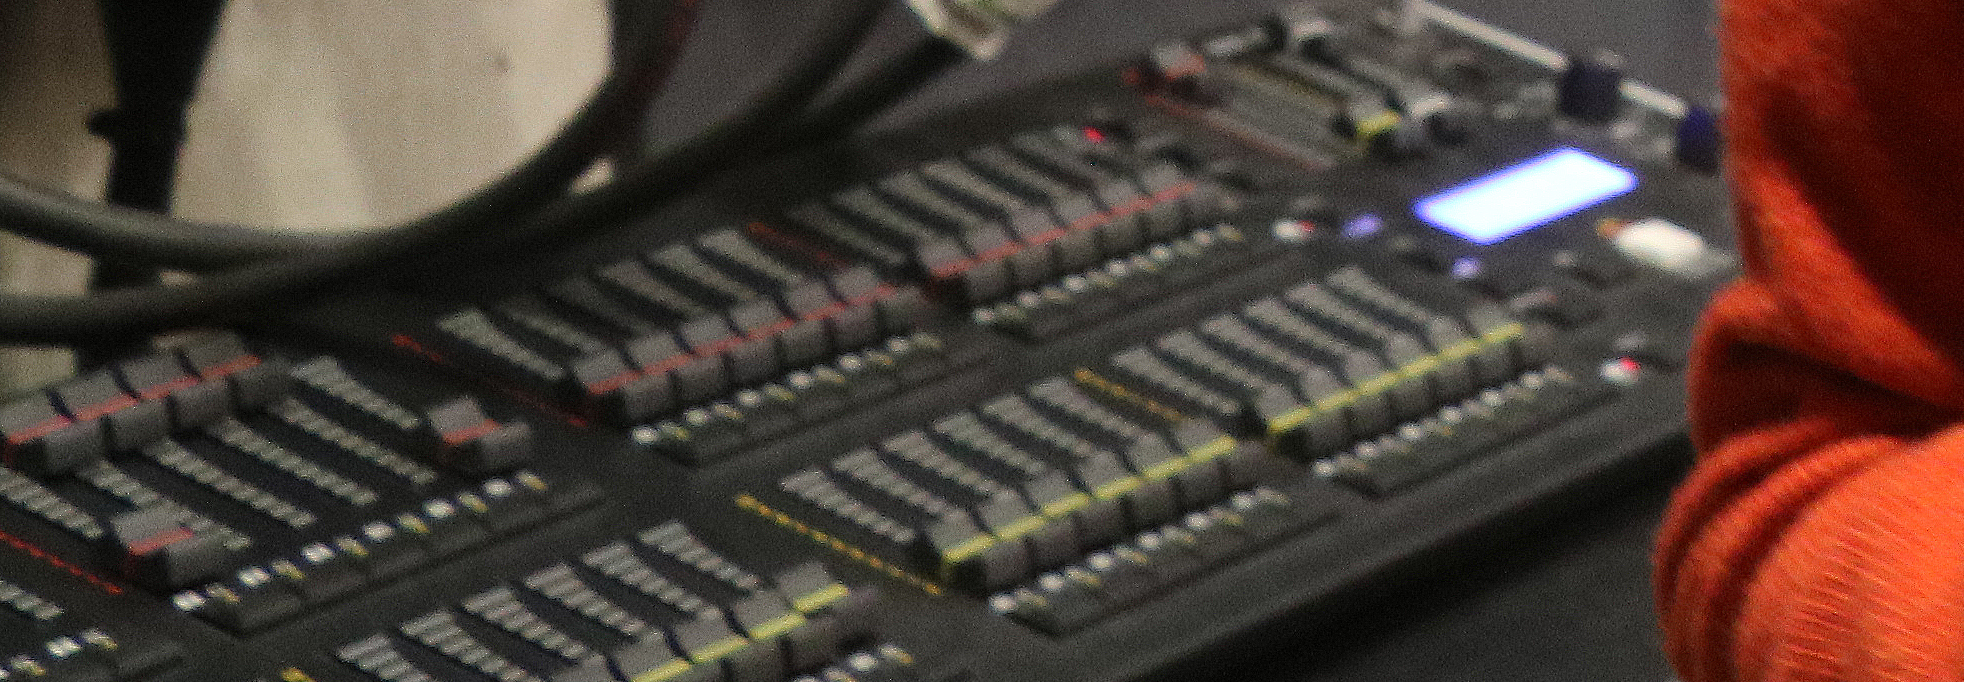 Introduction To Digital Sound Design (Weekend)